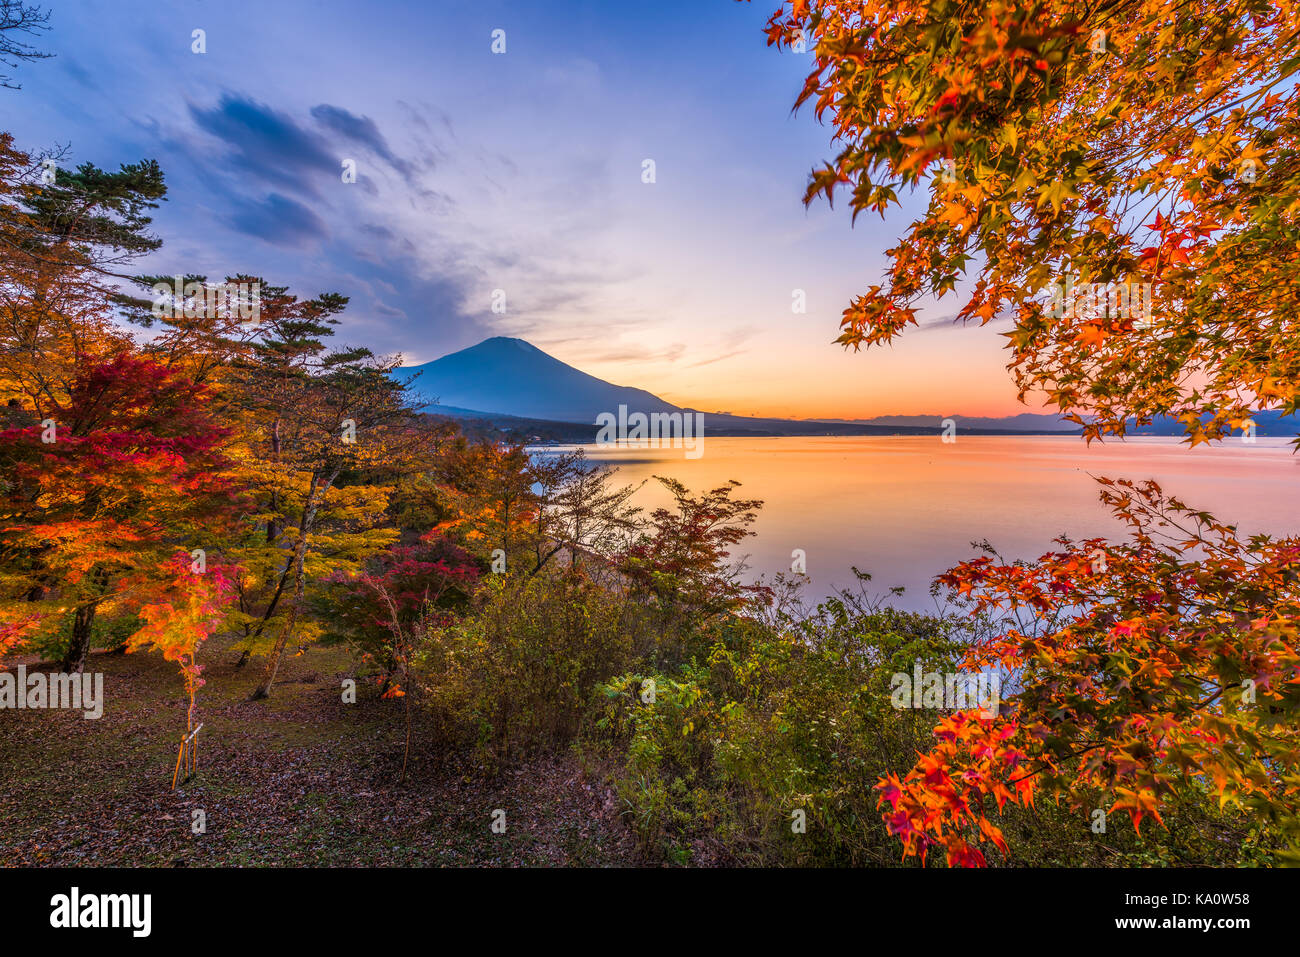 Lake Yamanaka, Yamanashi, Japan with Mt. Fuji during autumn season. - Stock Image